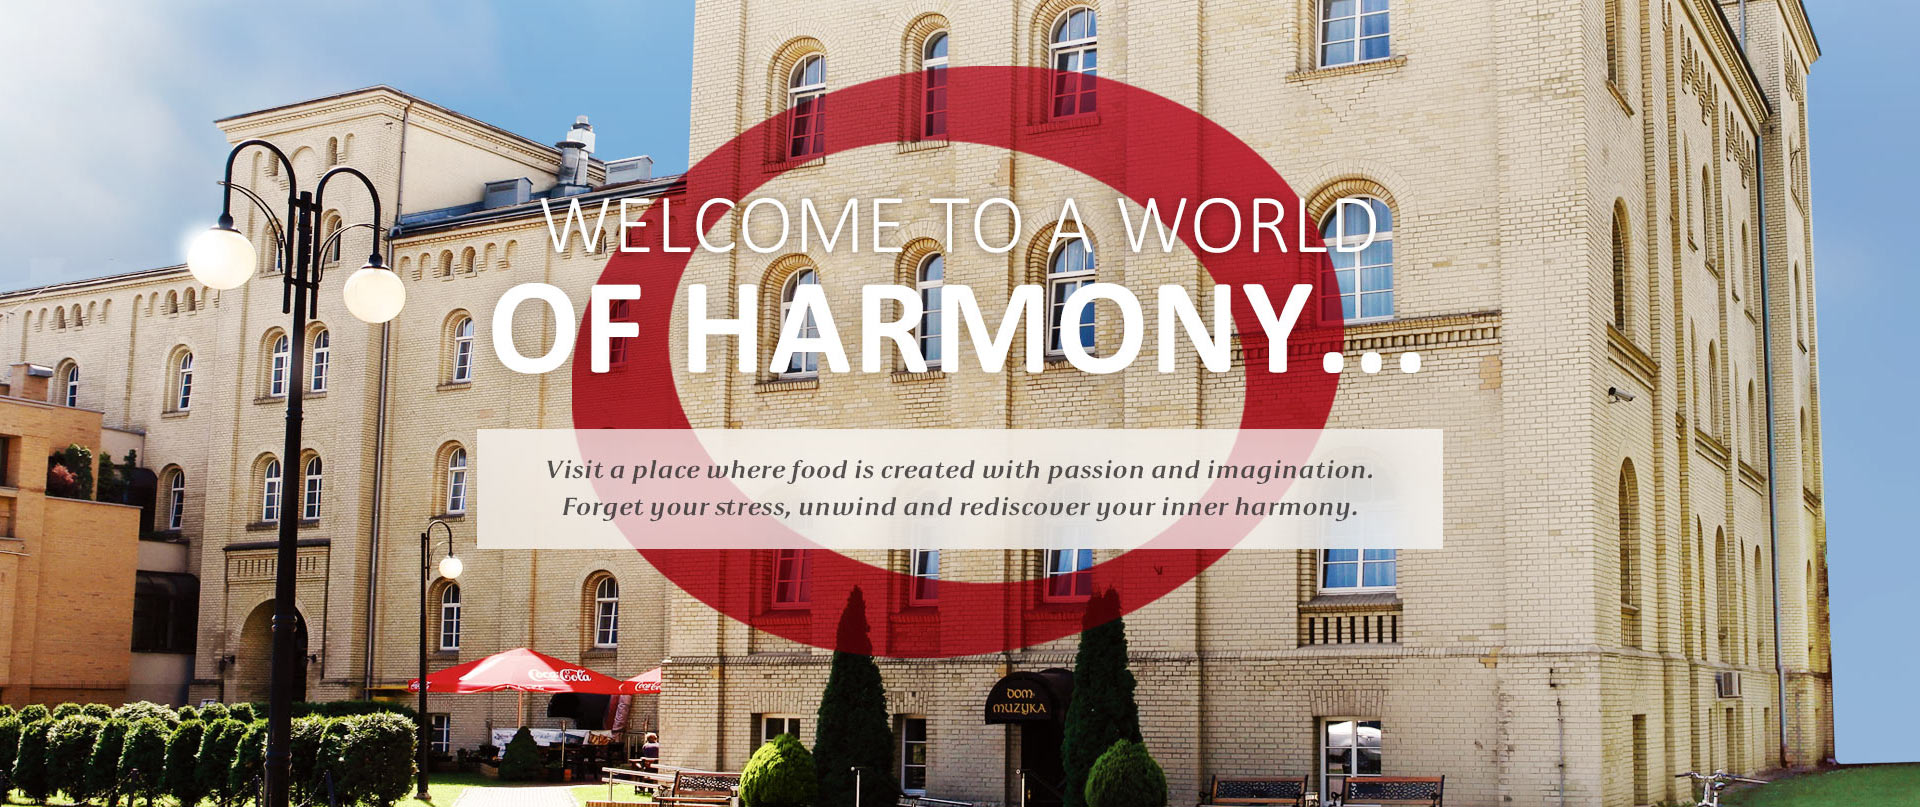 Harmony Restaurant - Our Restaurant